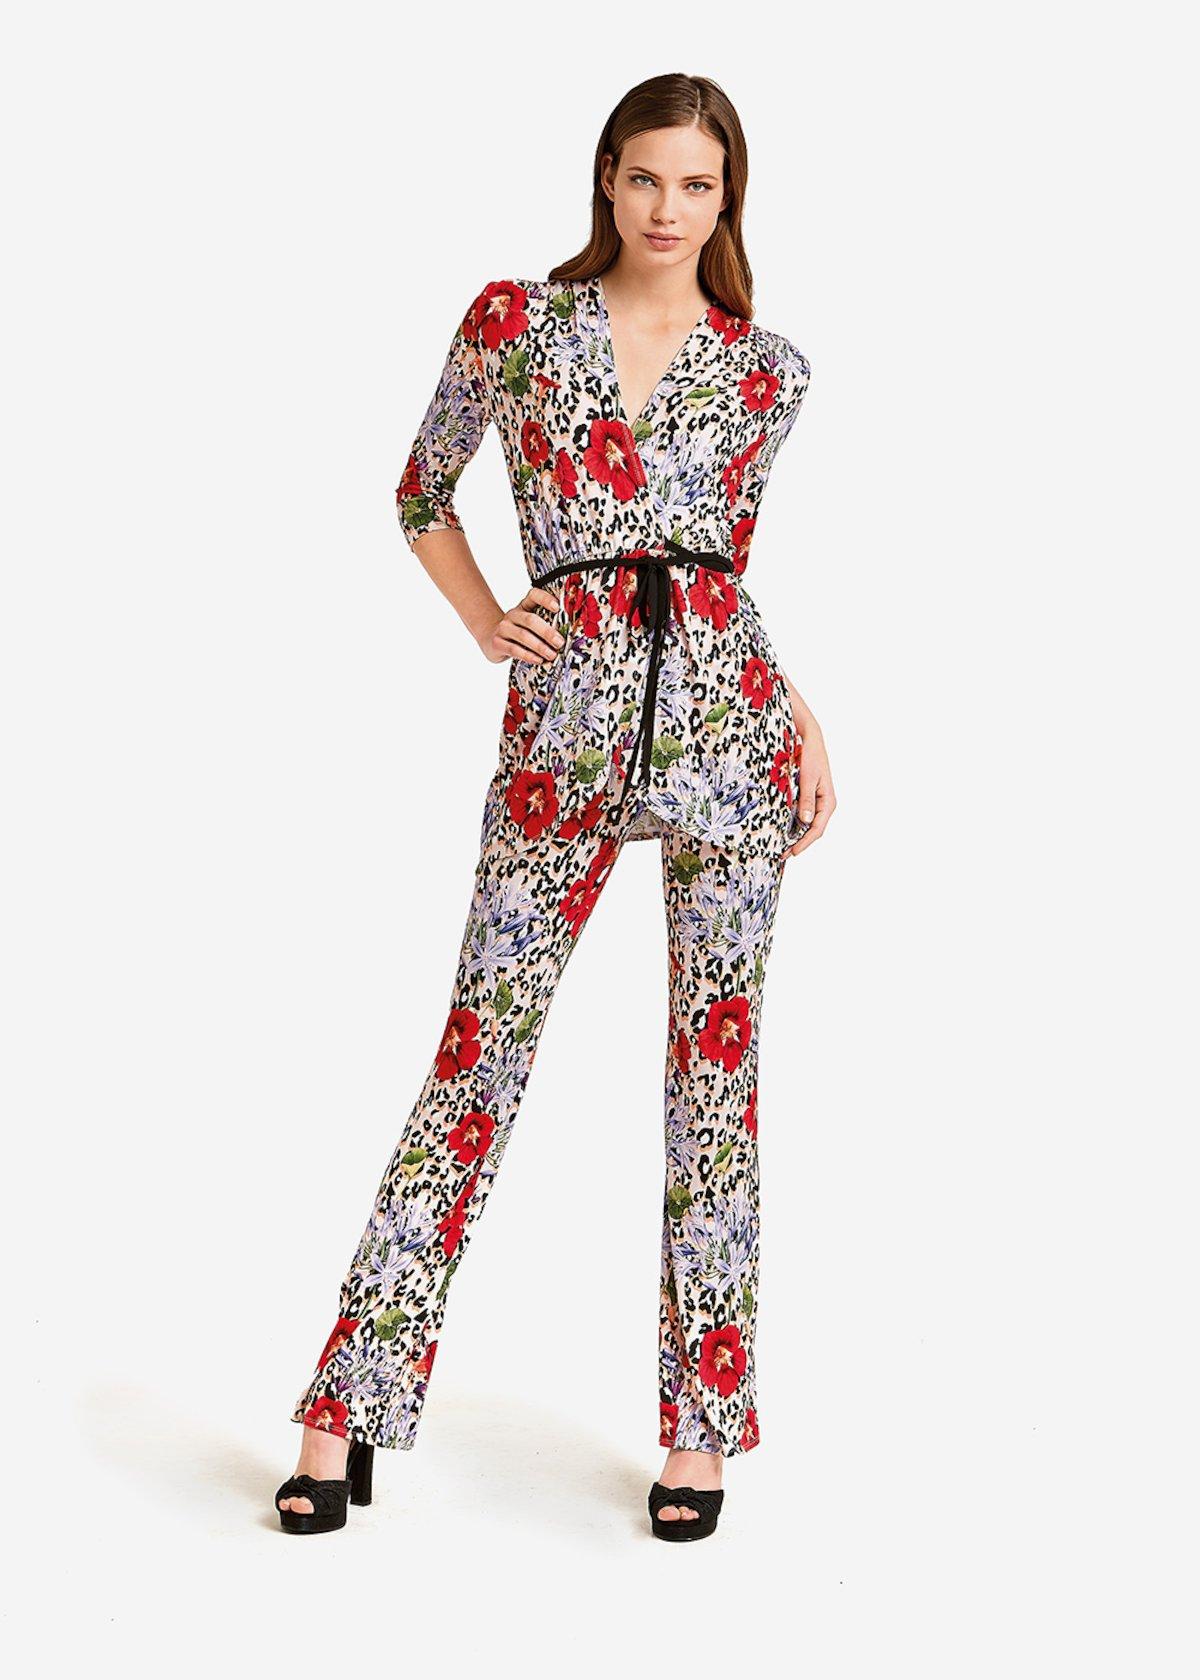 Pantaloni Priamo stampa maculata con rose - White / Rouge Animalier